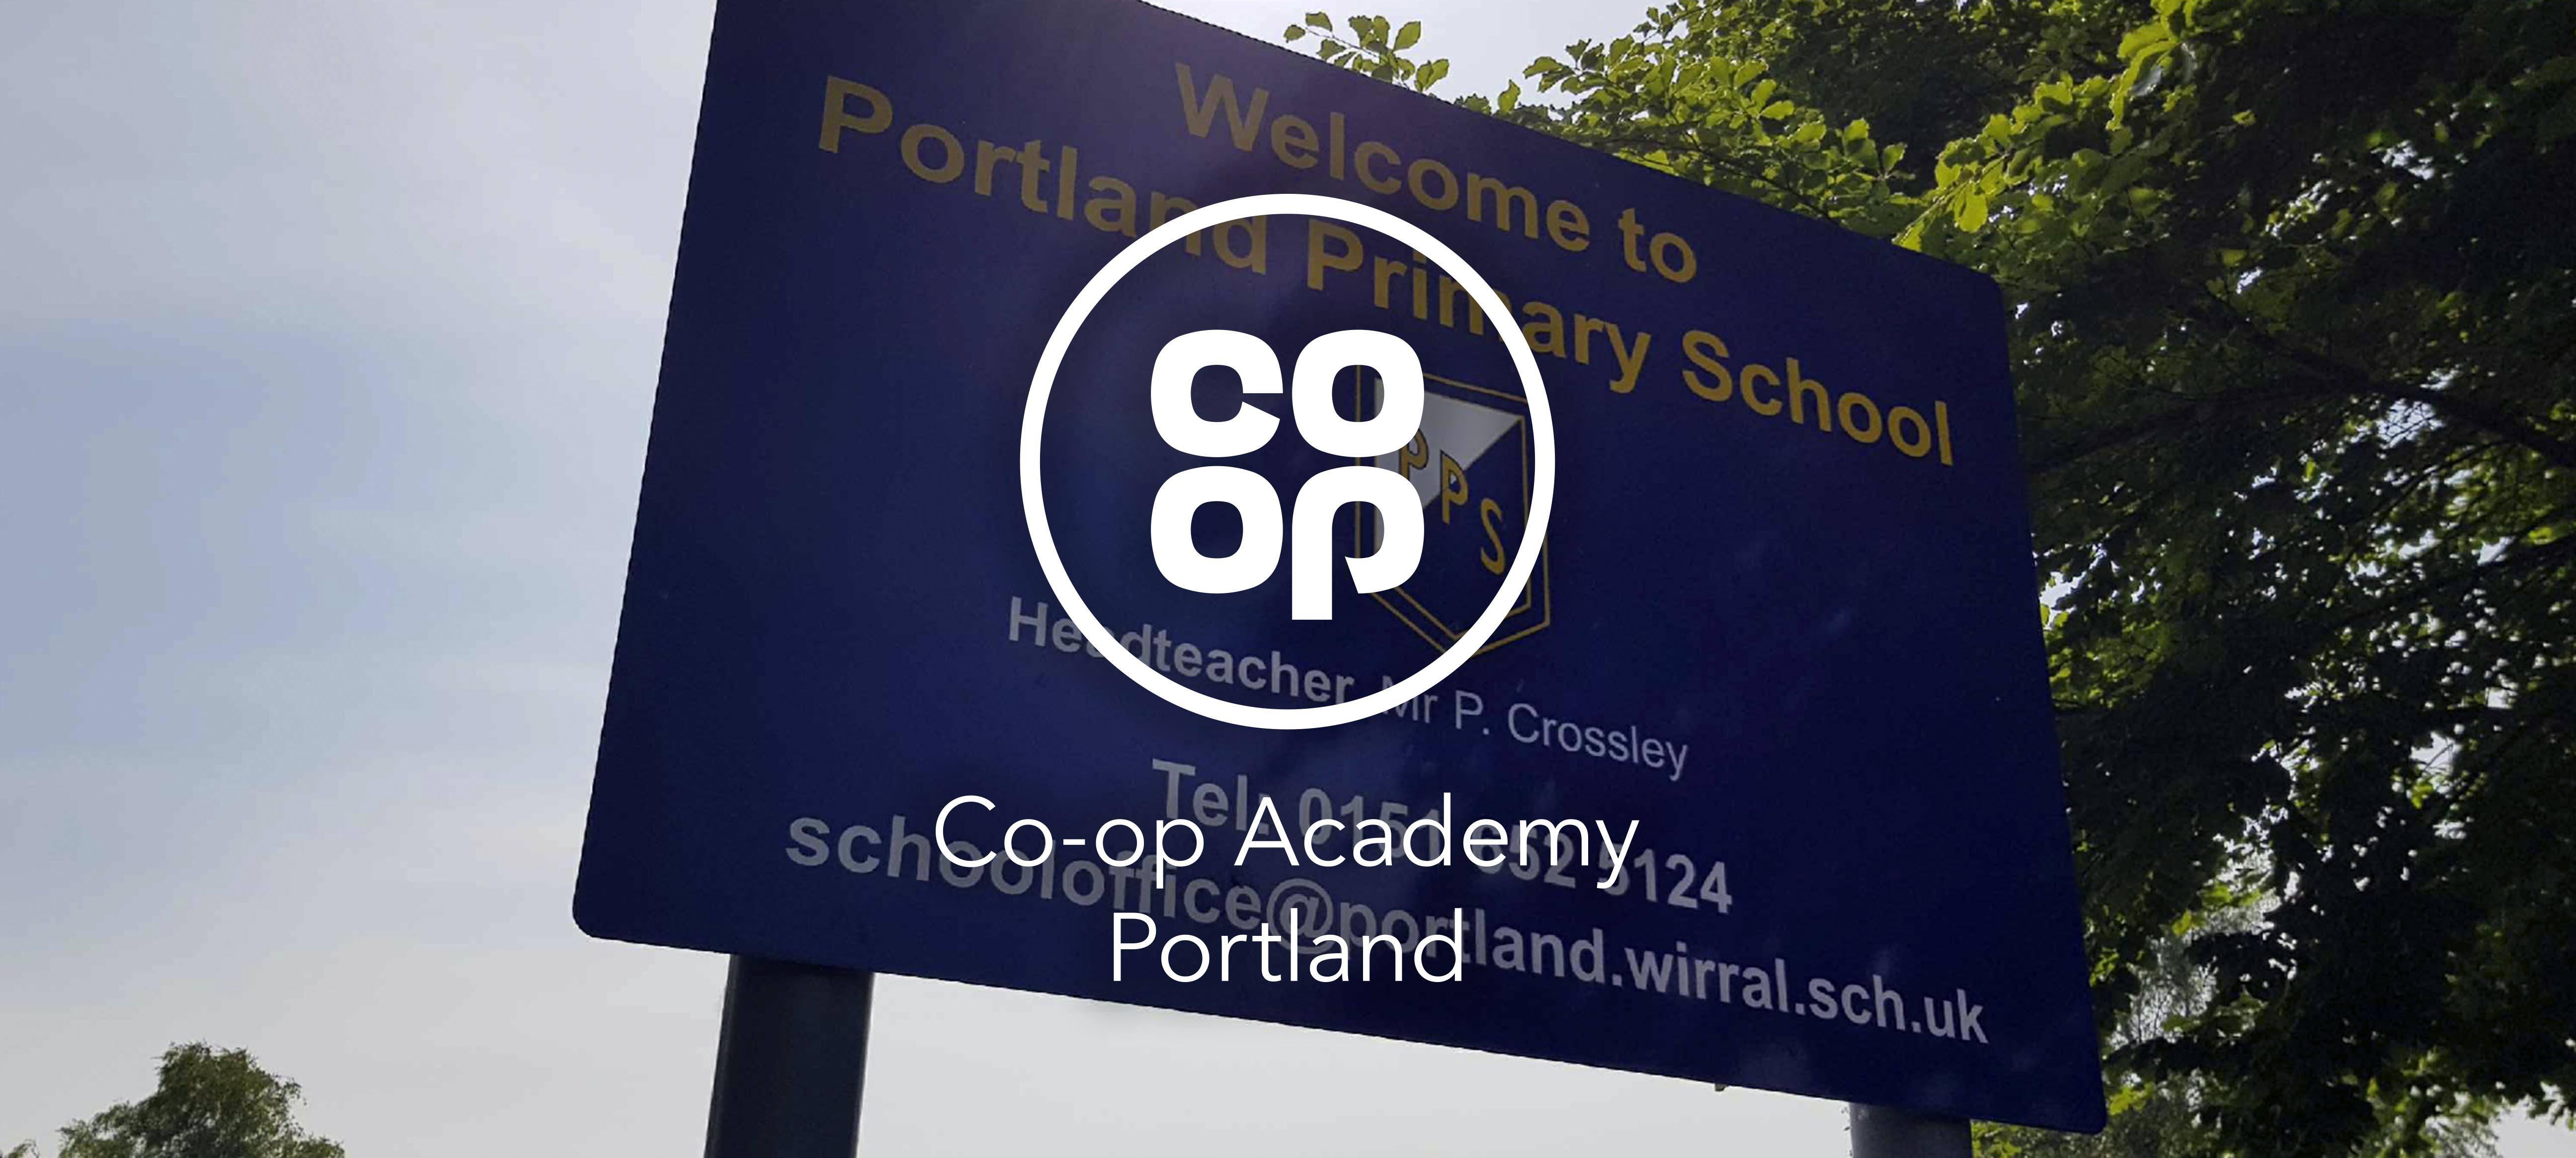 Portland Primary School becomes first Merseyside school to join Co-op Academies Trust